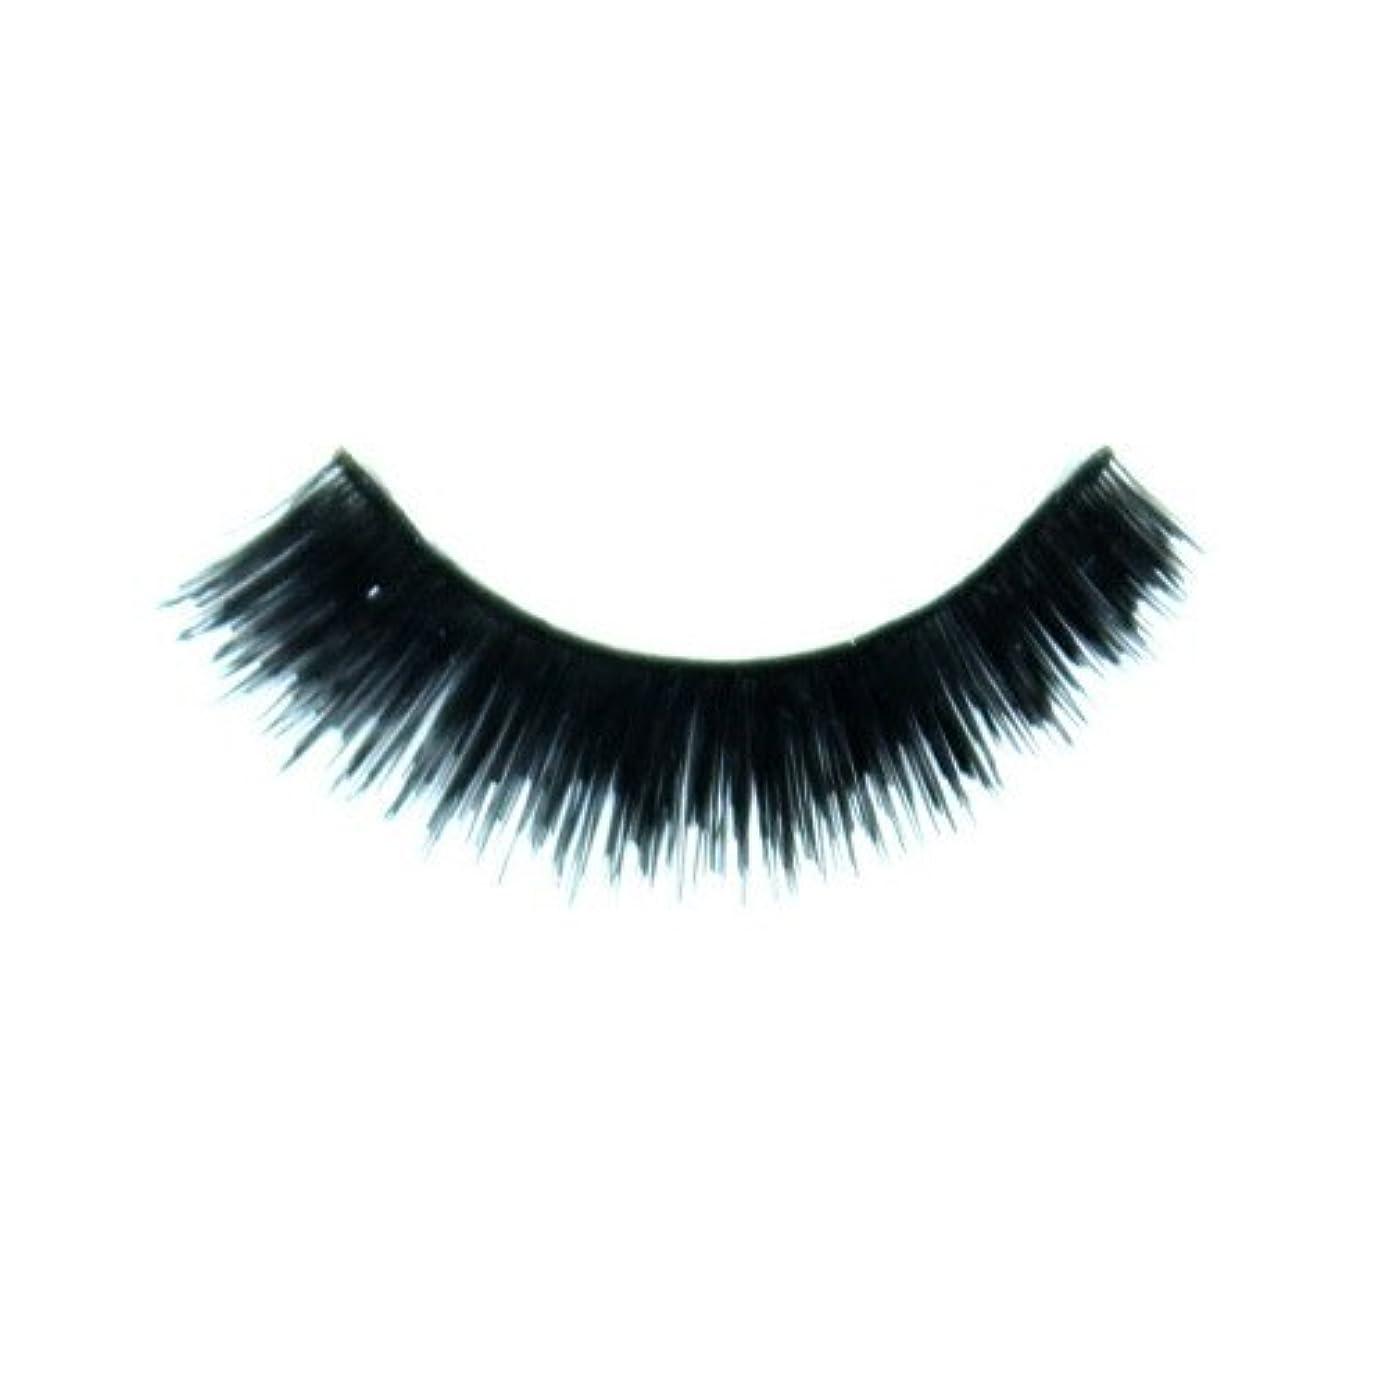 部分重量把握(6 Pack) CHERRY BLOSSOM False Eyelashes - CBFL018 (並行輸入品)